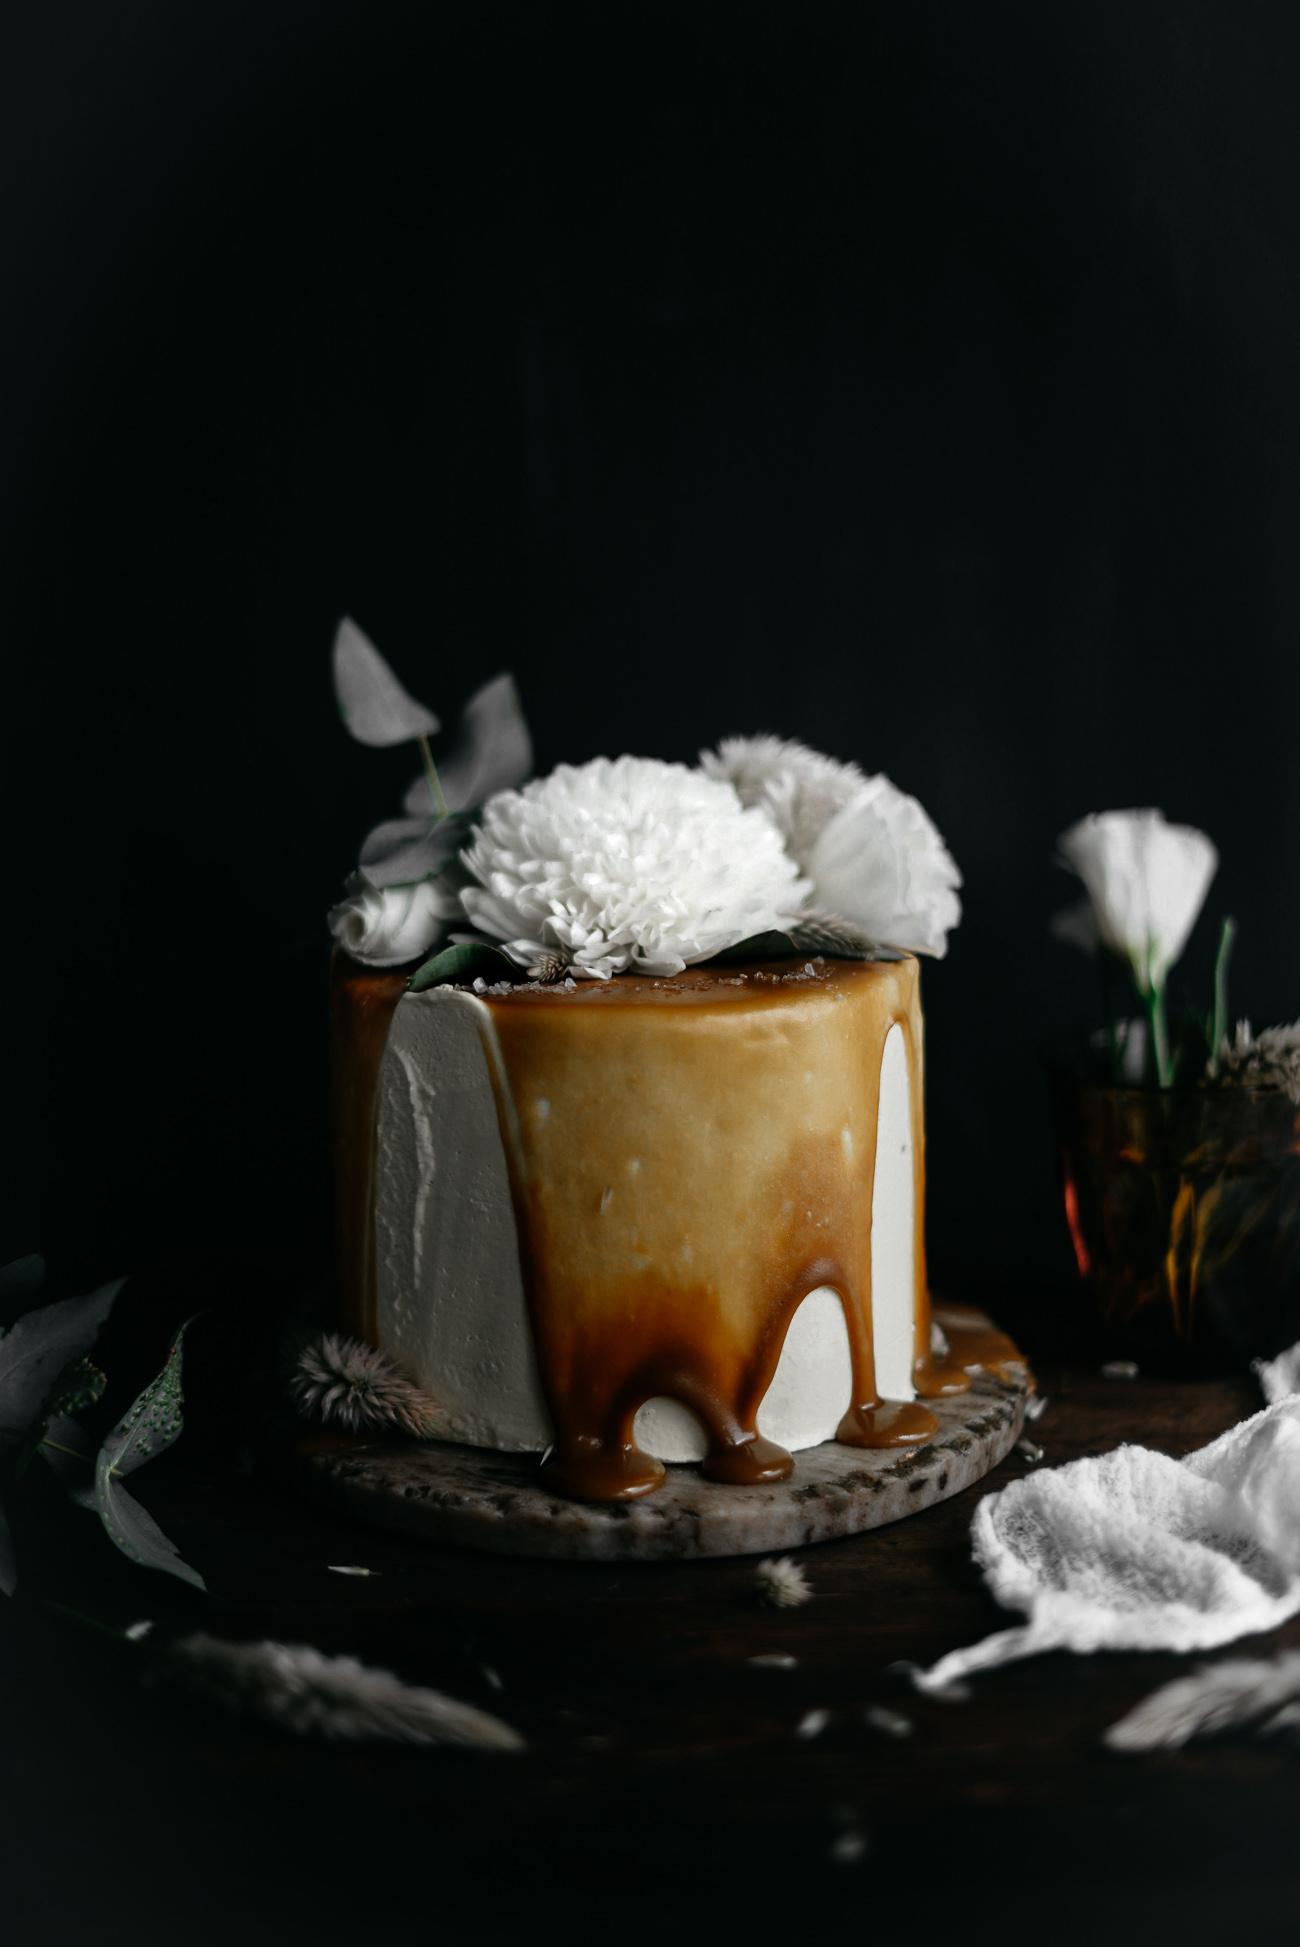 Italian-Orange-Blossom-and-Almond-Cake-with-Orange-Curd-Mascarpone-Swiss-Meringue-Buttercream-and-Fleur-d'Oranger-Caramel-9.jpg